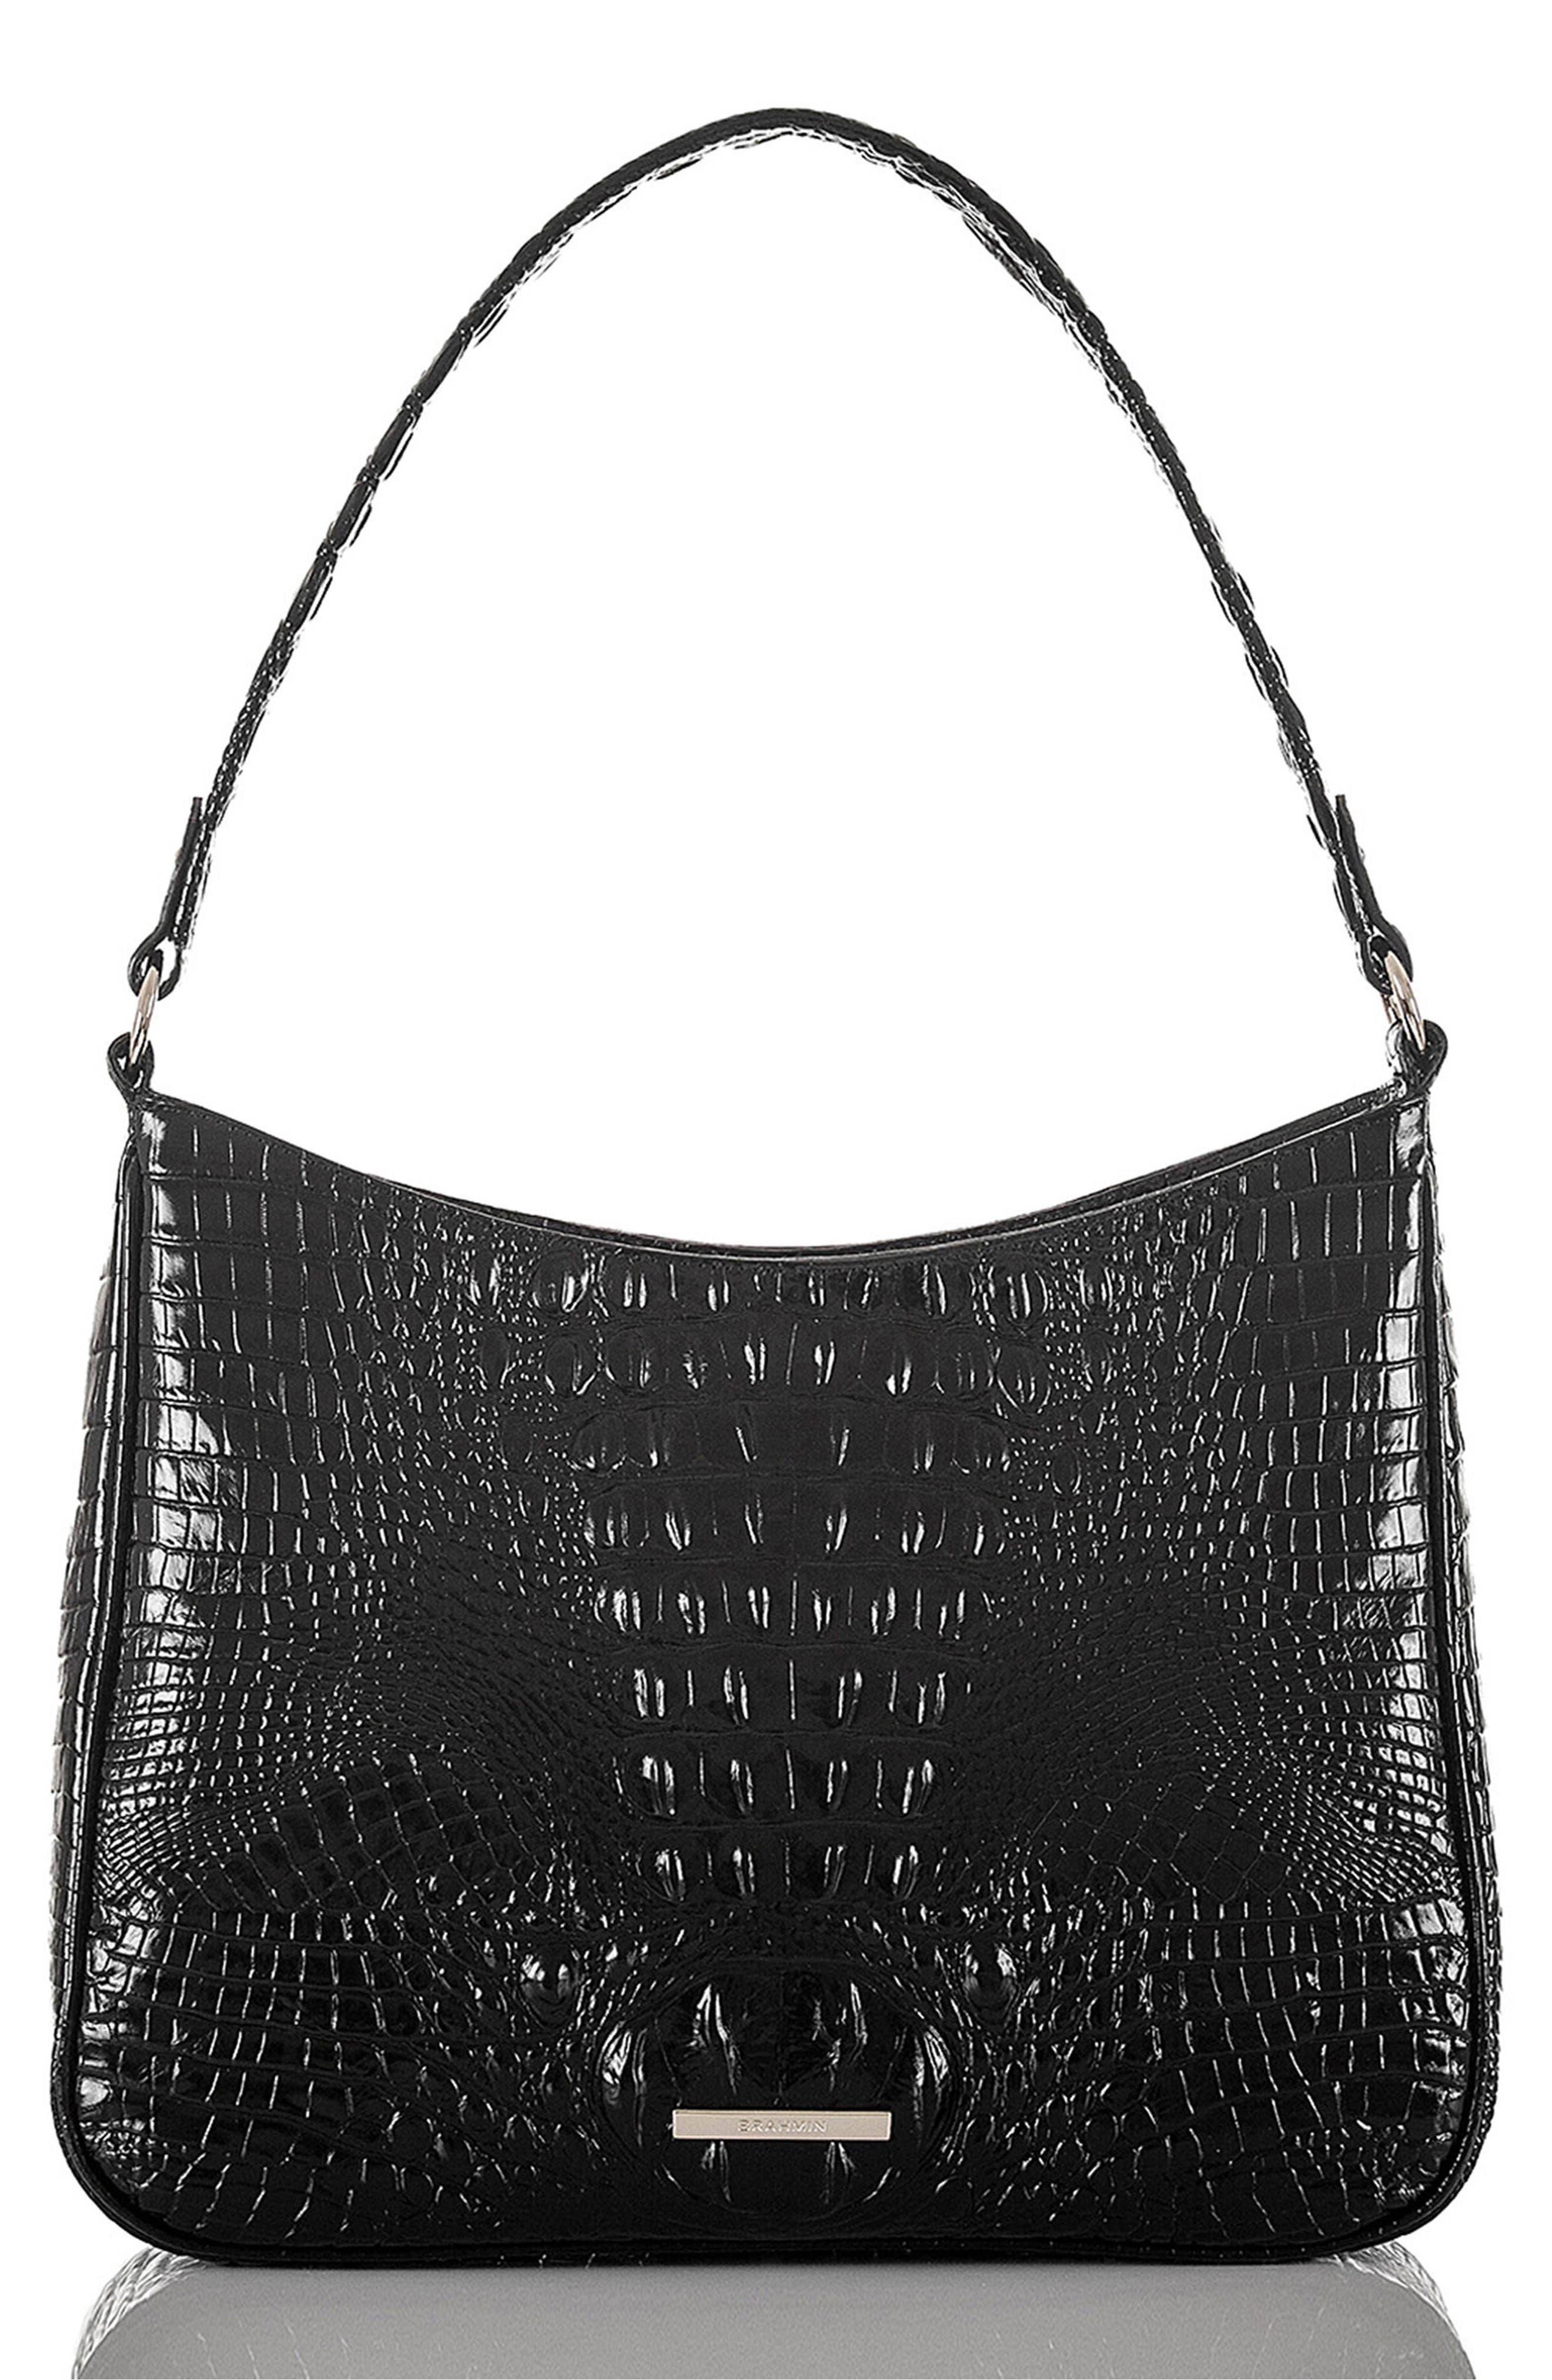 Noelle Croc Embossed Leather Hobo Bag,                             Main thumbnail 1, color,                             BLACK